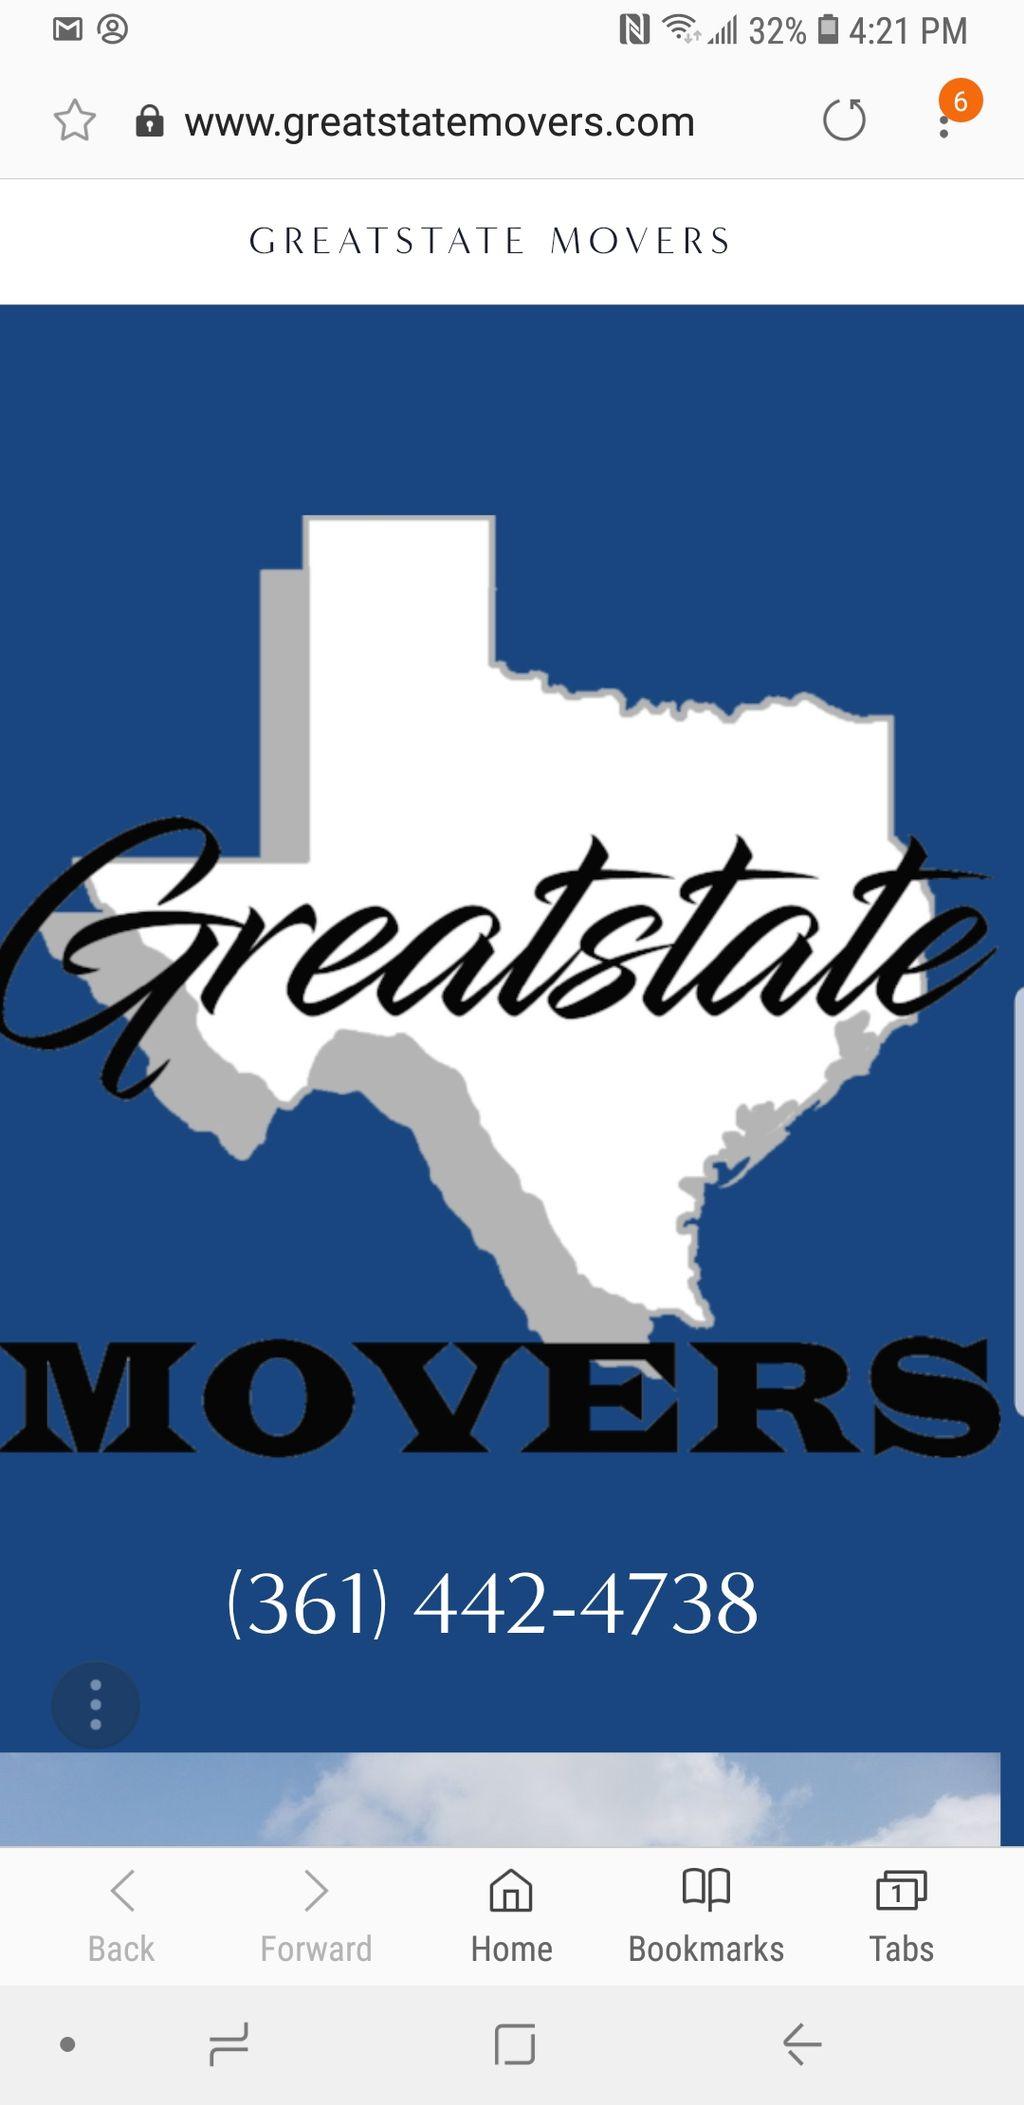 Greatstate movers